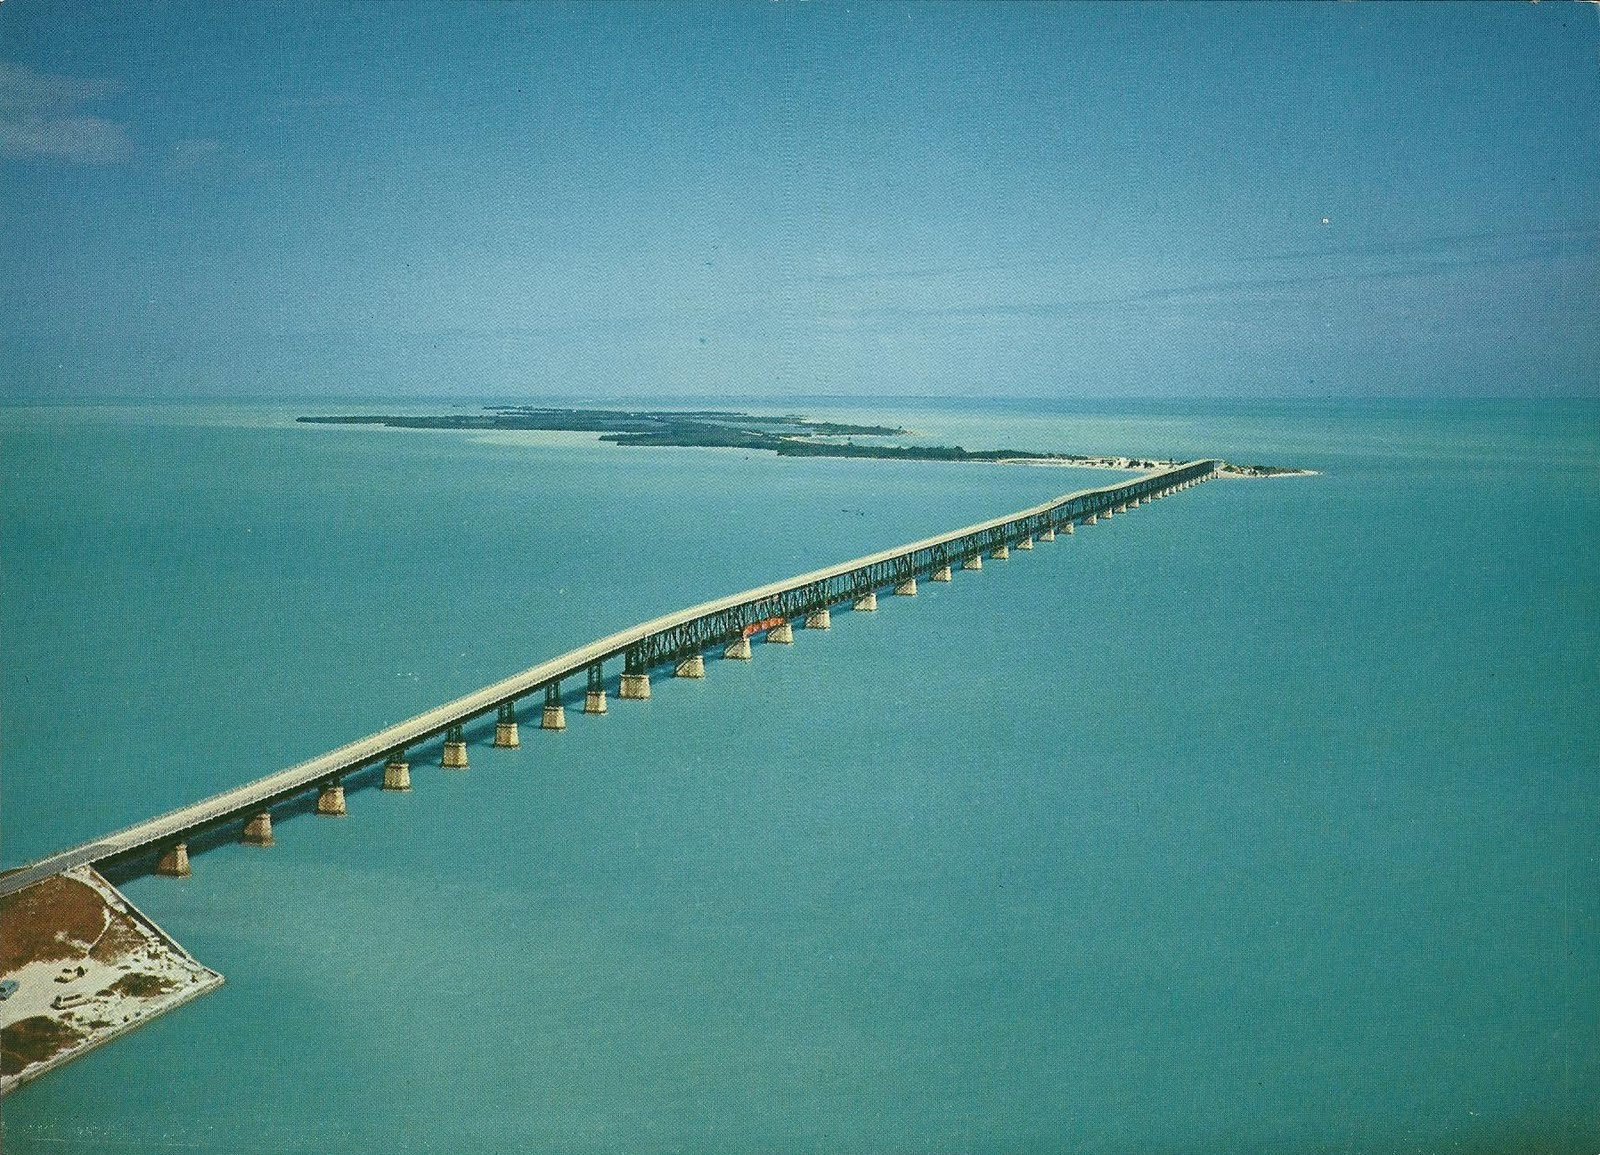 Winter Getaway To Florida S Best Beaches Panama City Destinations Examiner Com